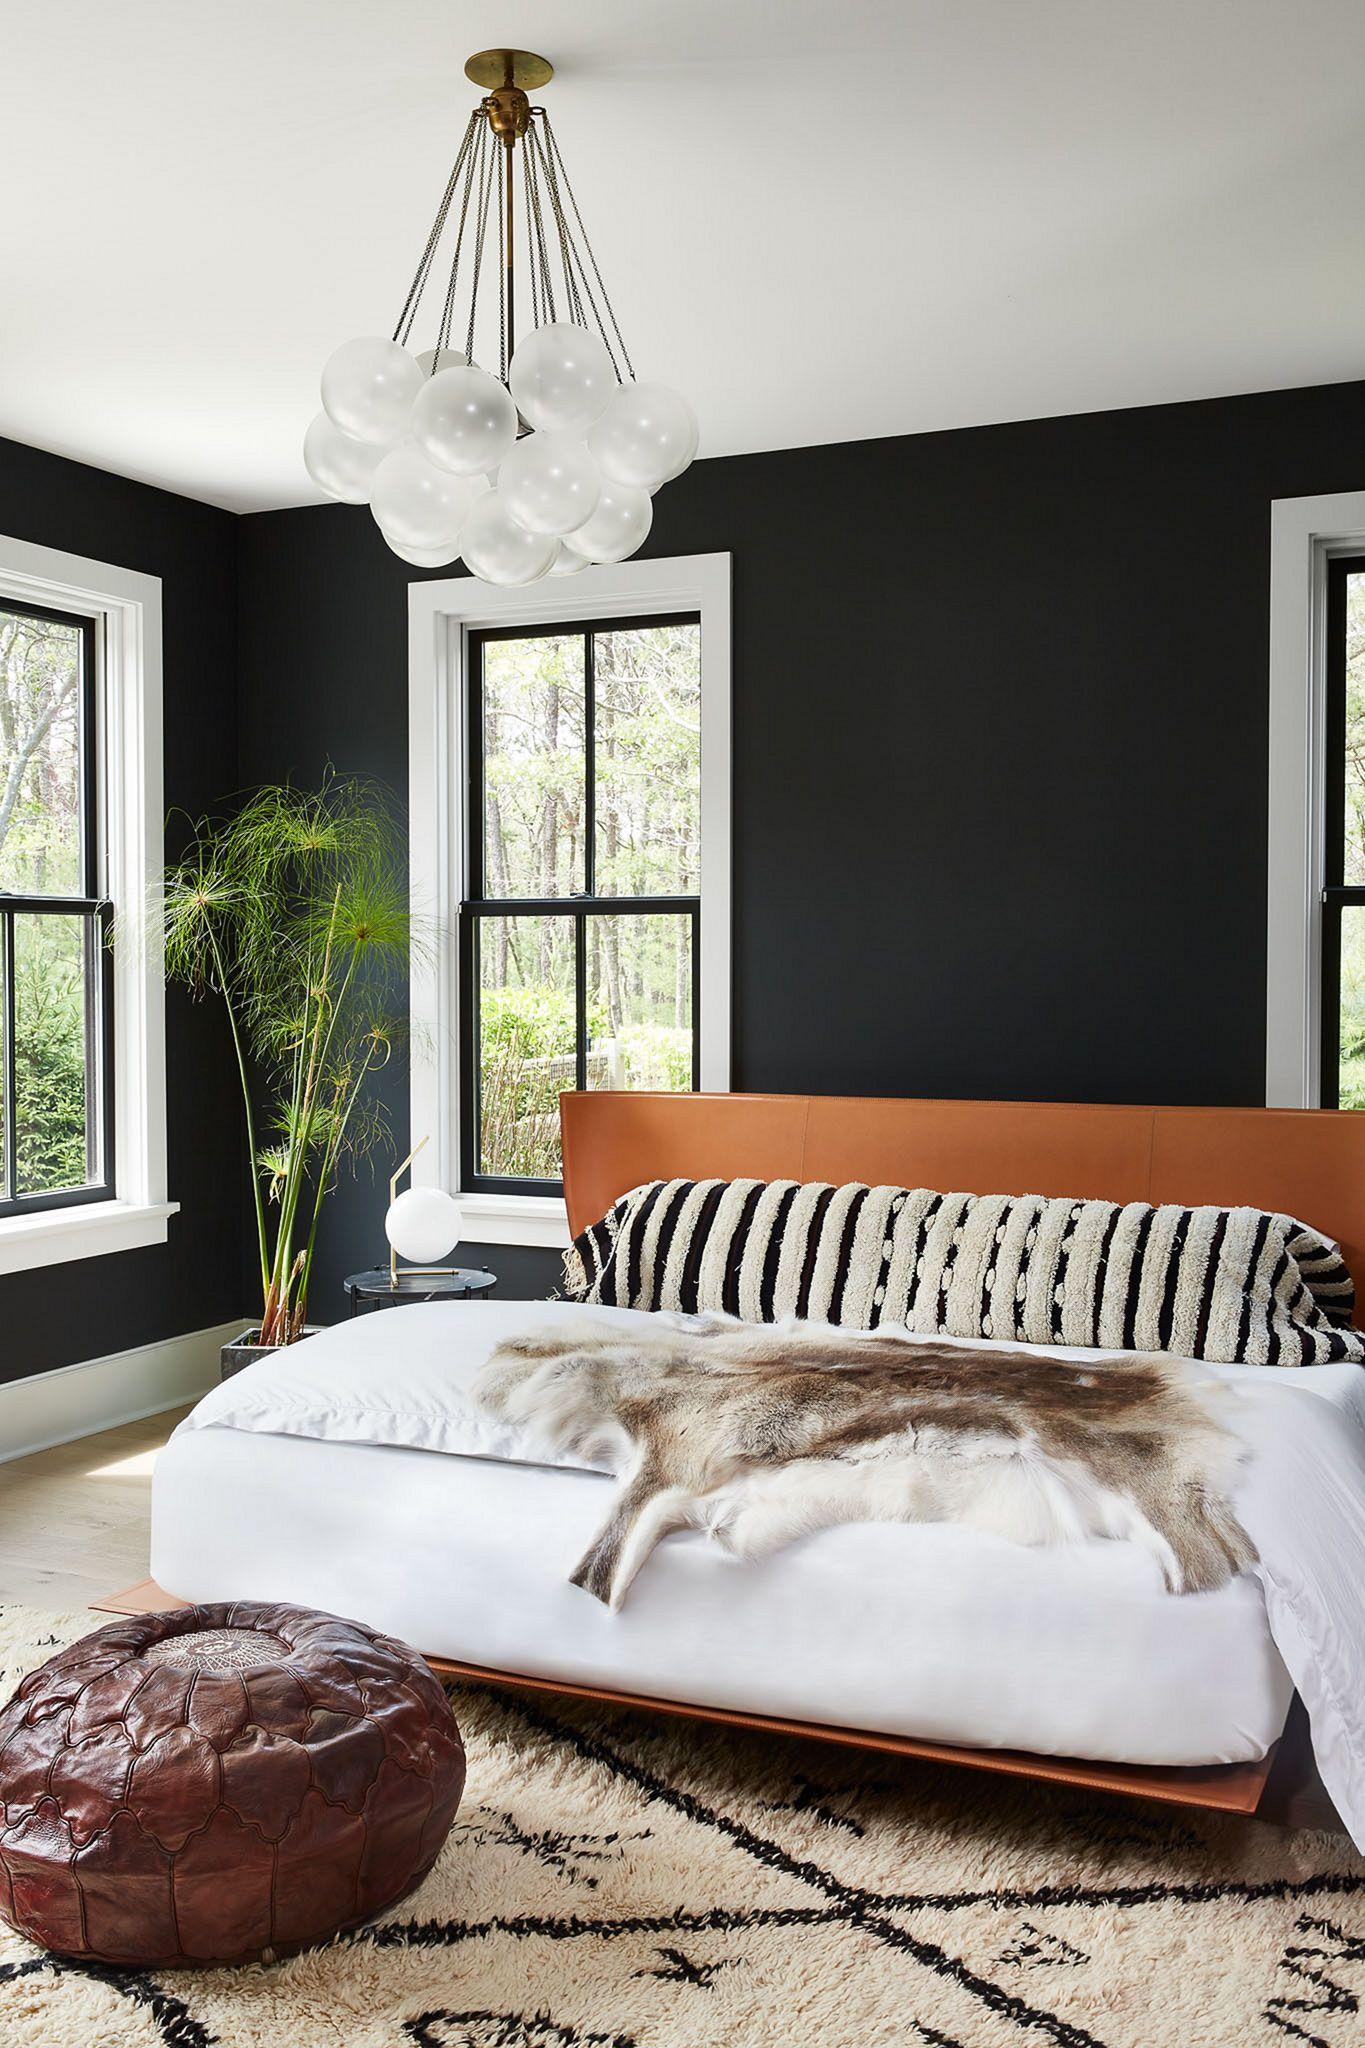 Romantic Master Bedroom Decorating Ideas (Romantic Master ... on Boho Master Bedroom Ideas  id=53022